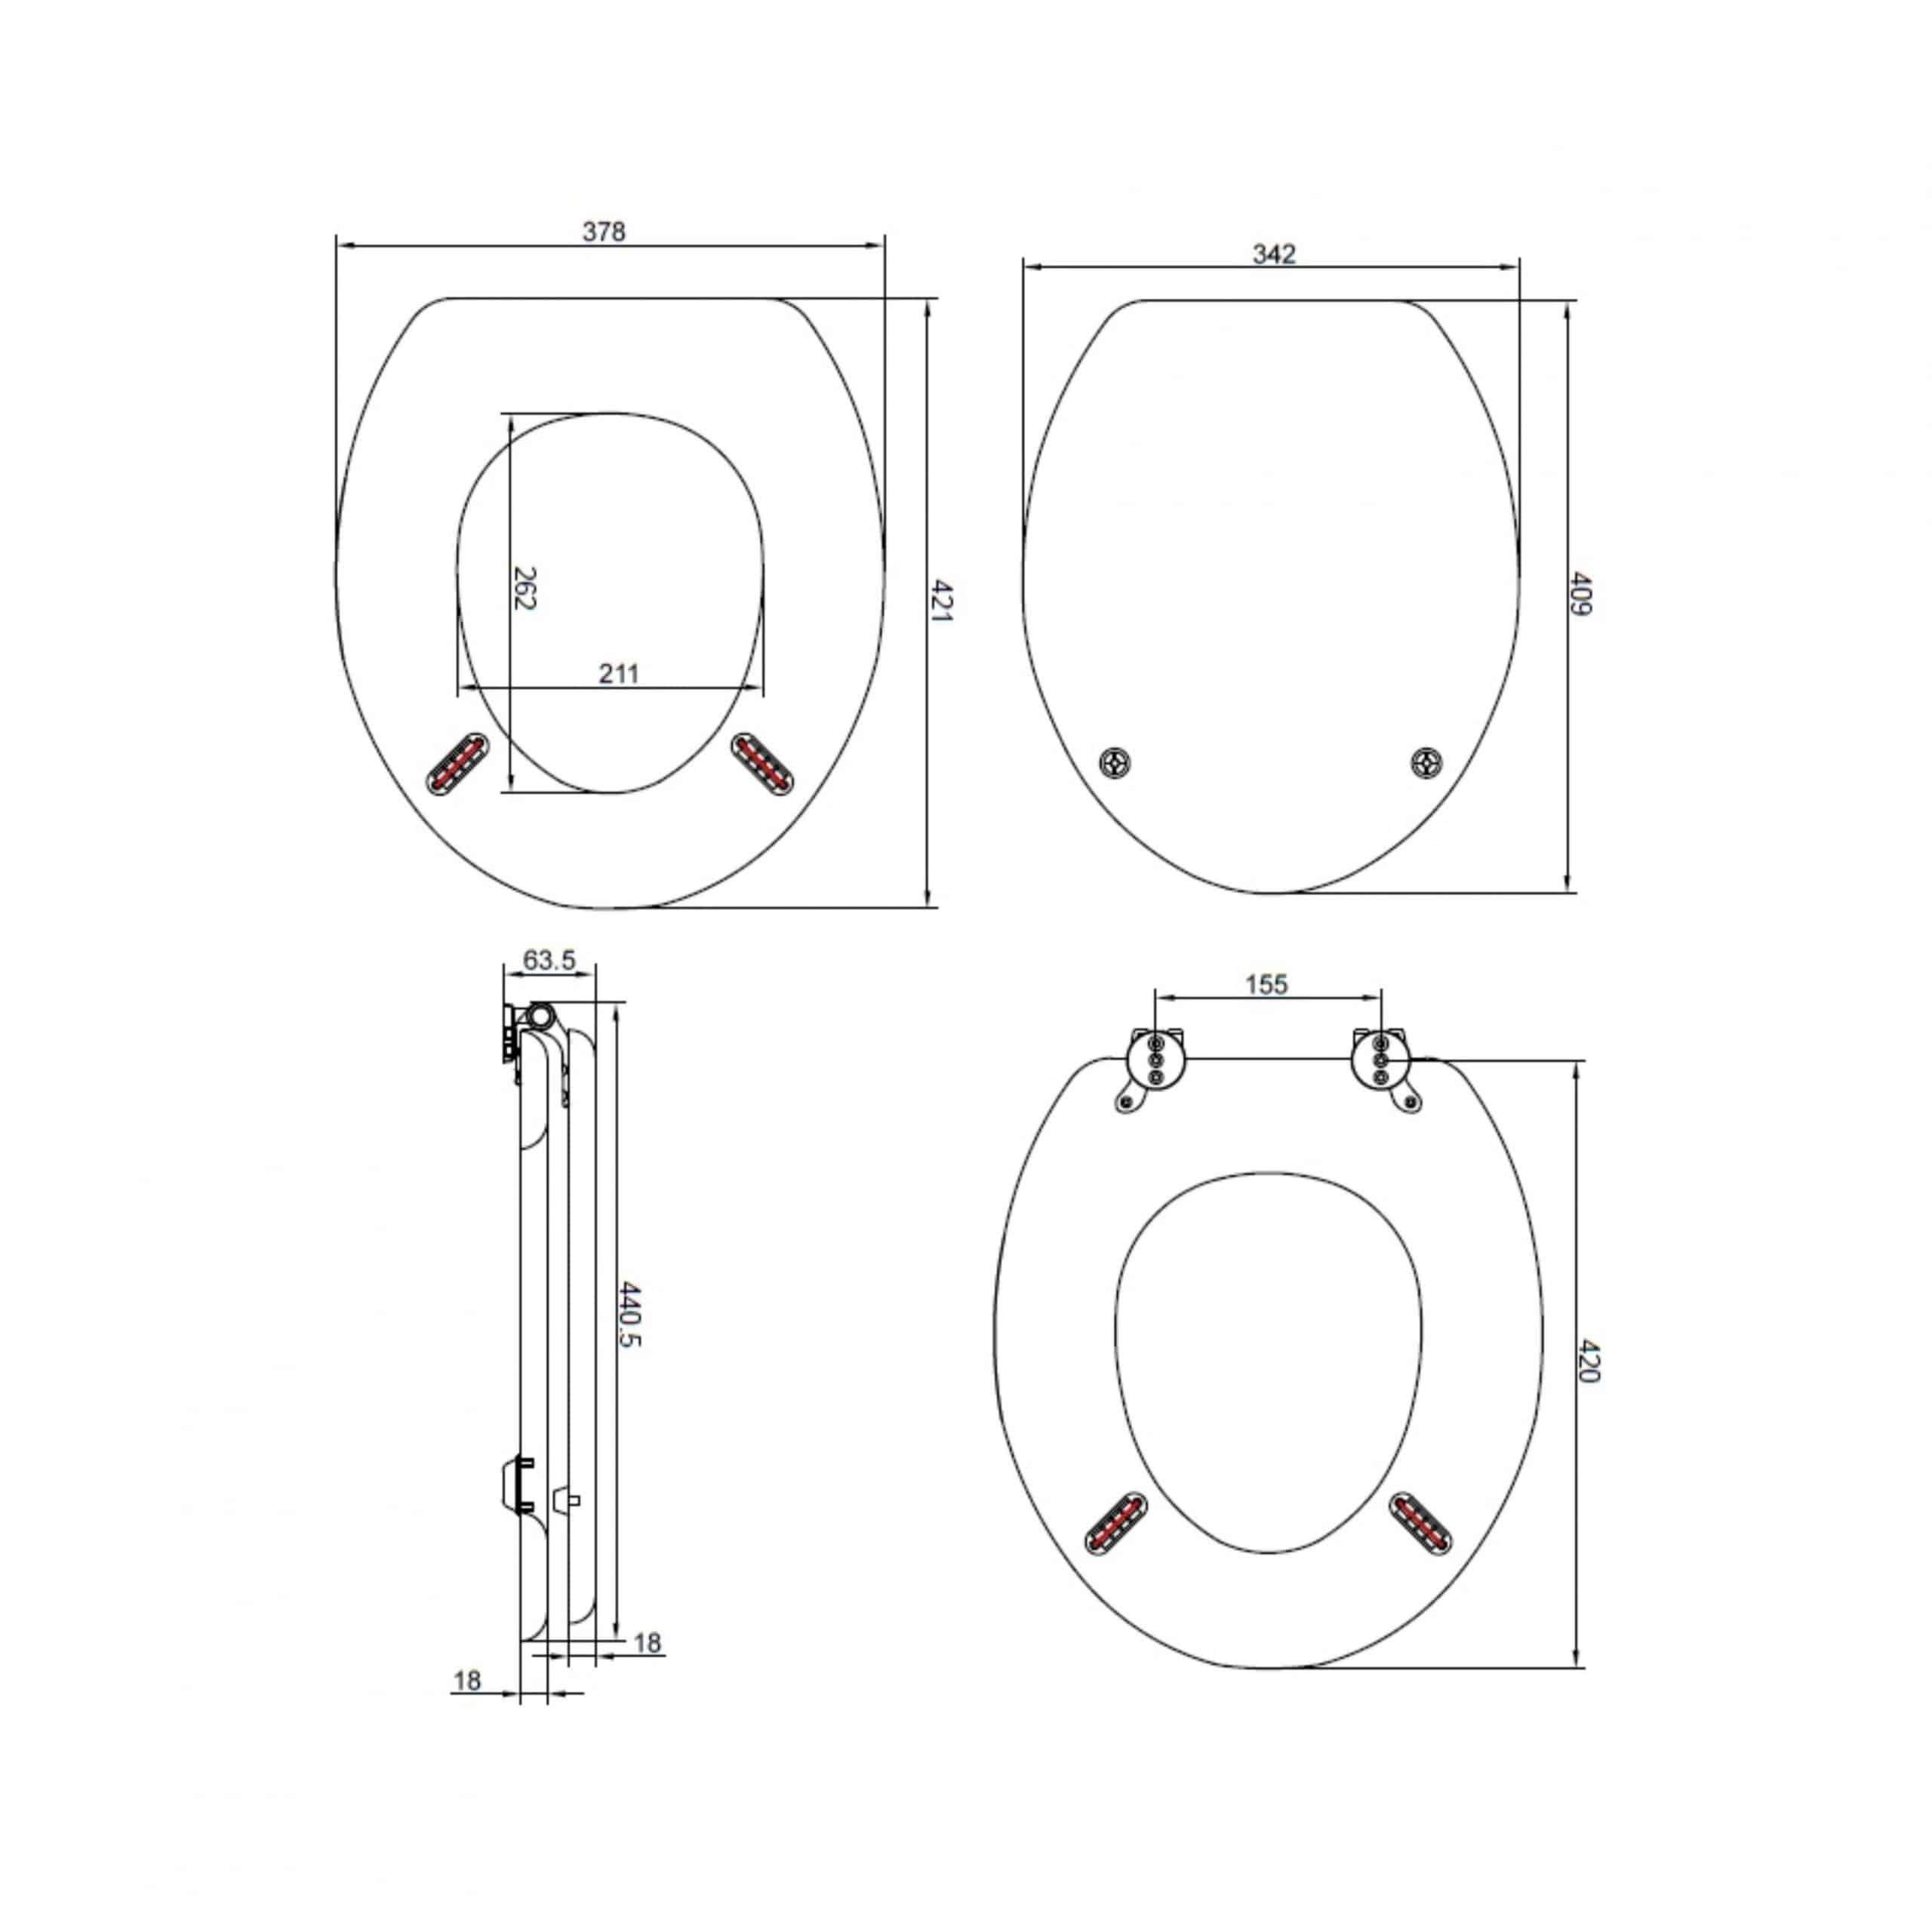 Heritage Wood Seat TSGRA101 Measurements